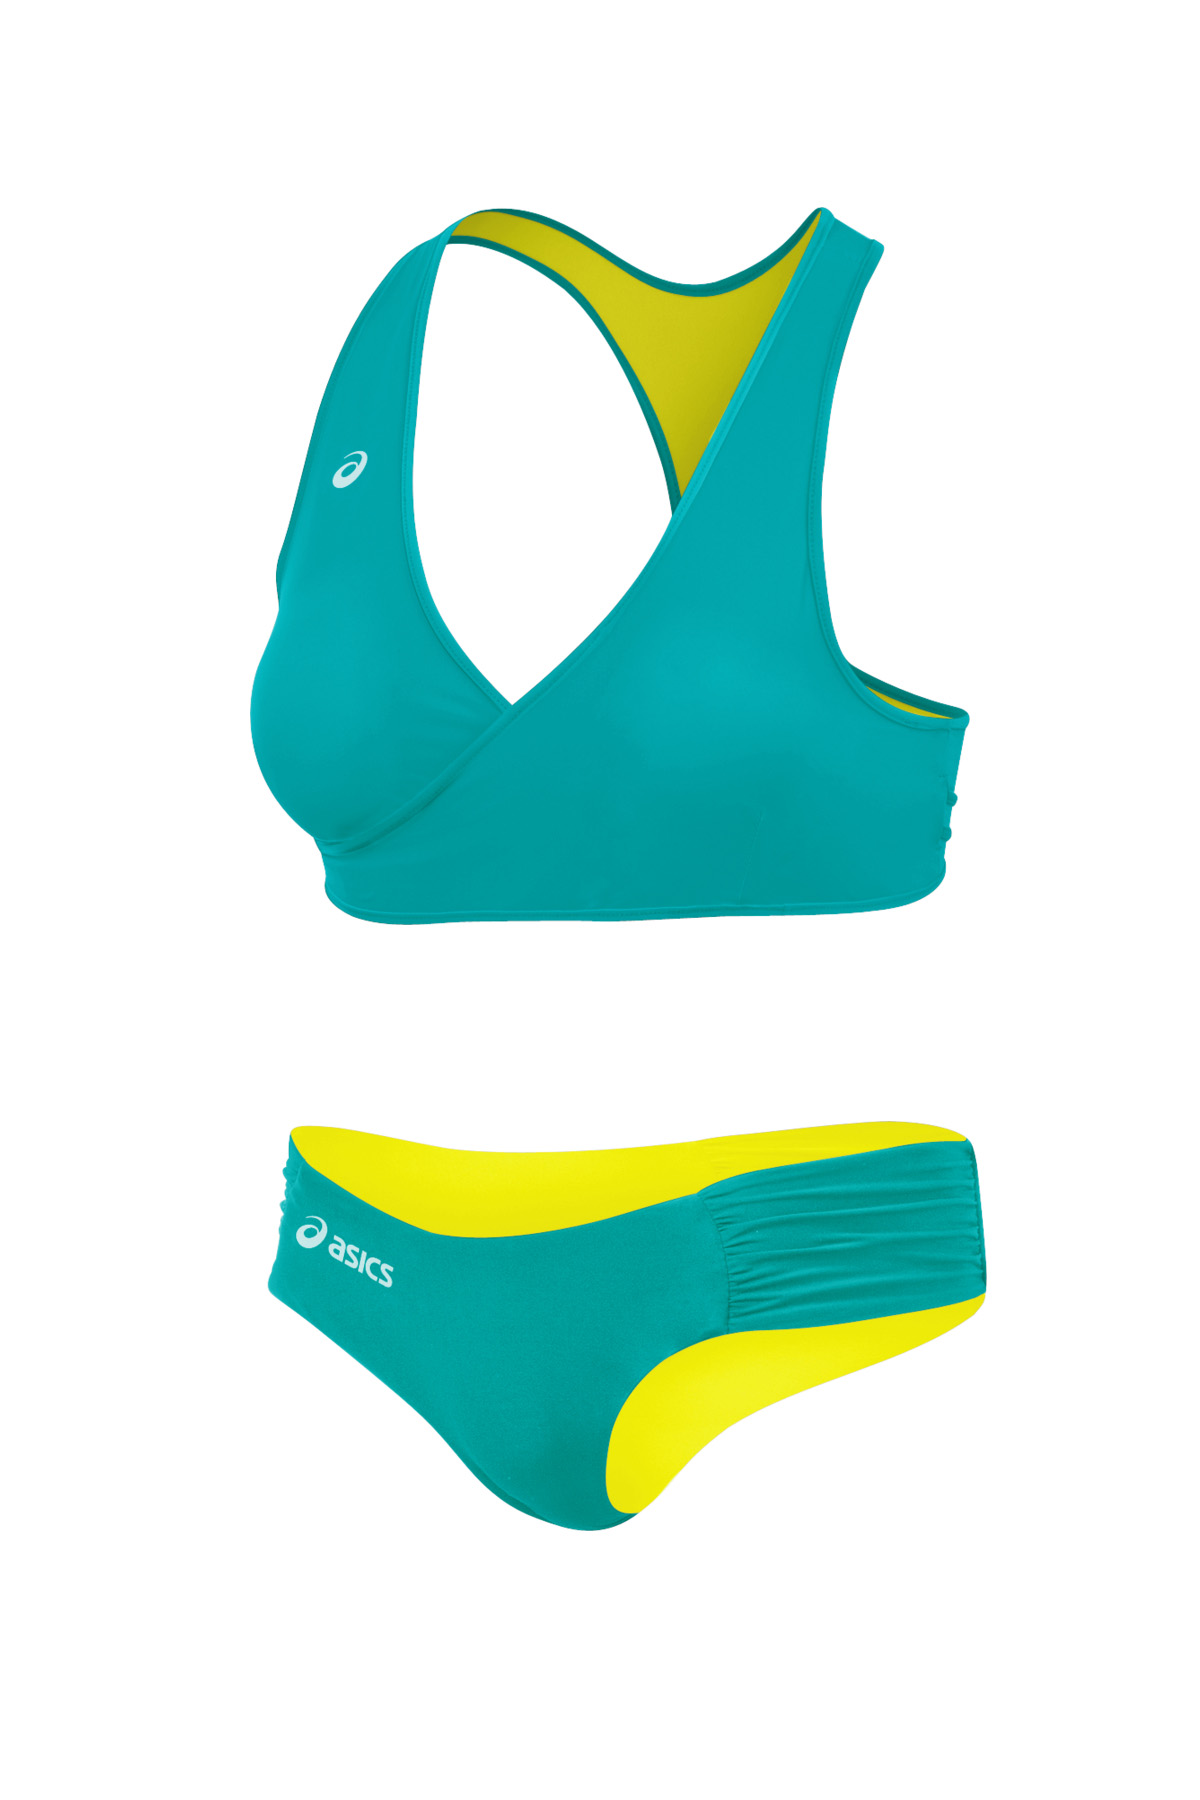 asics swimwear Green